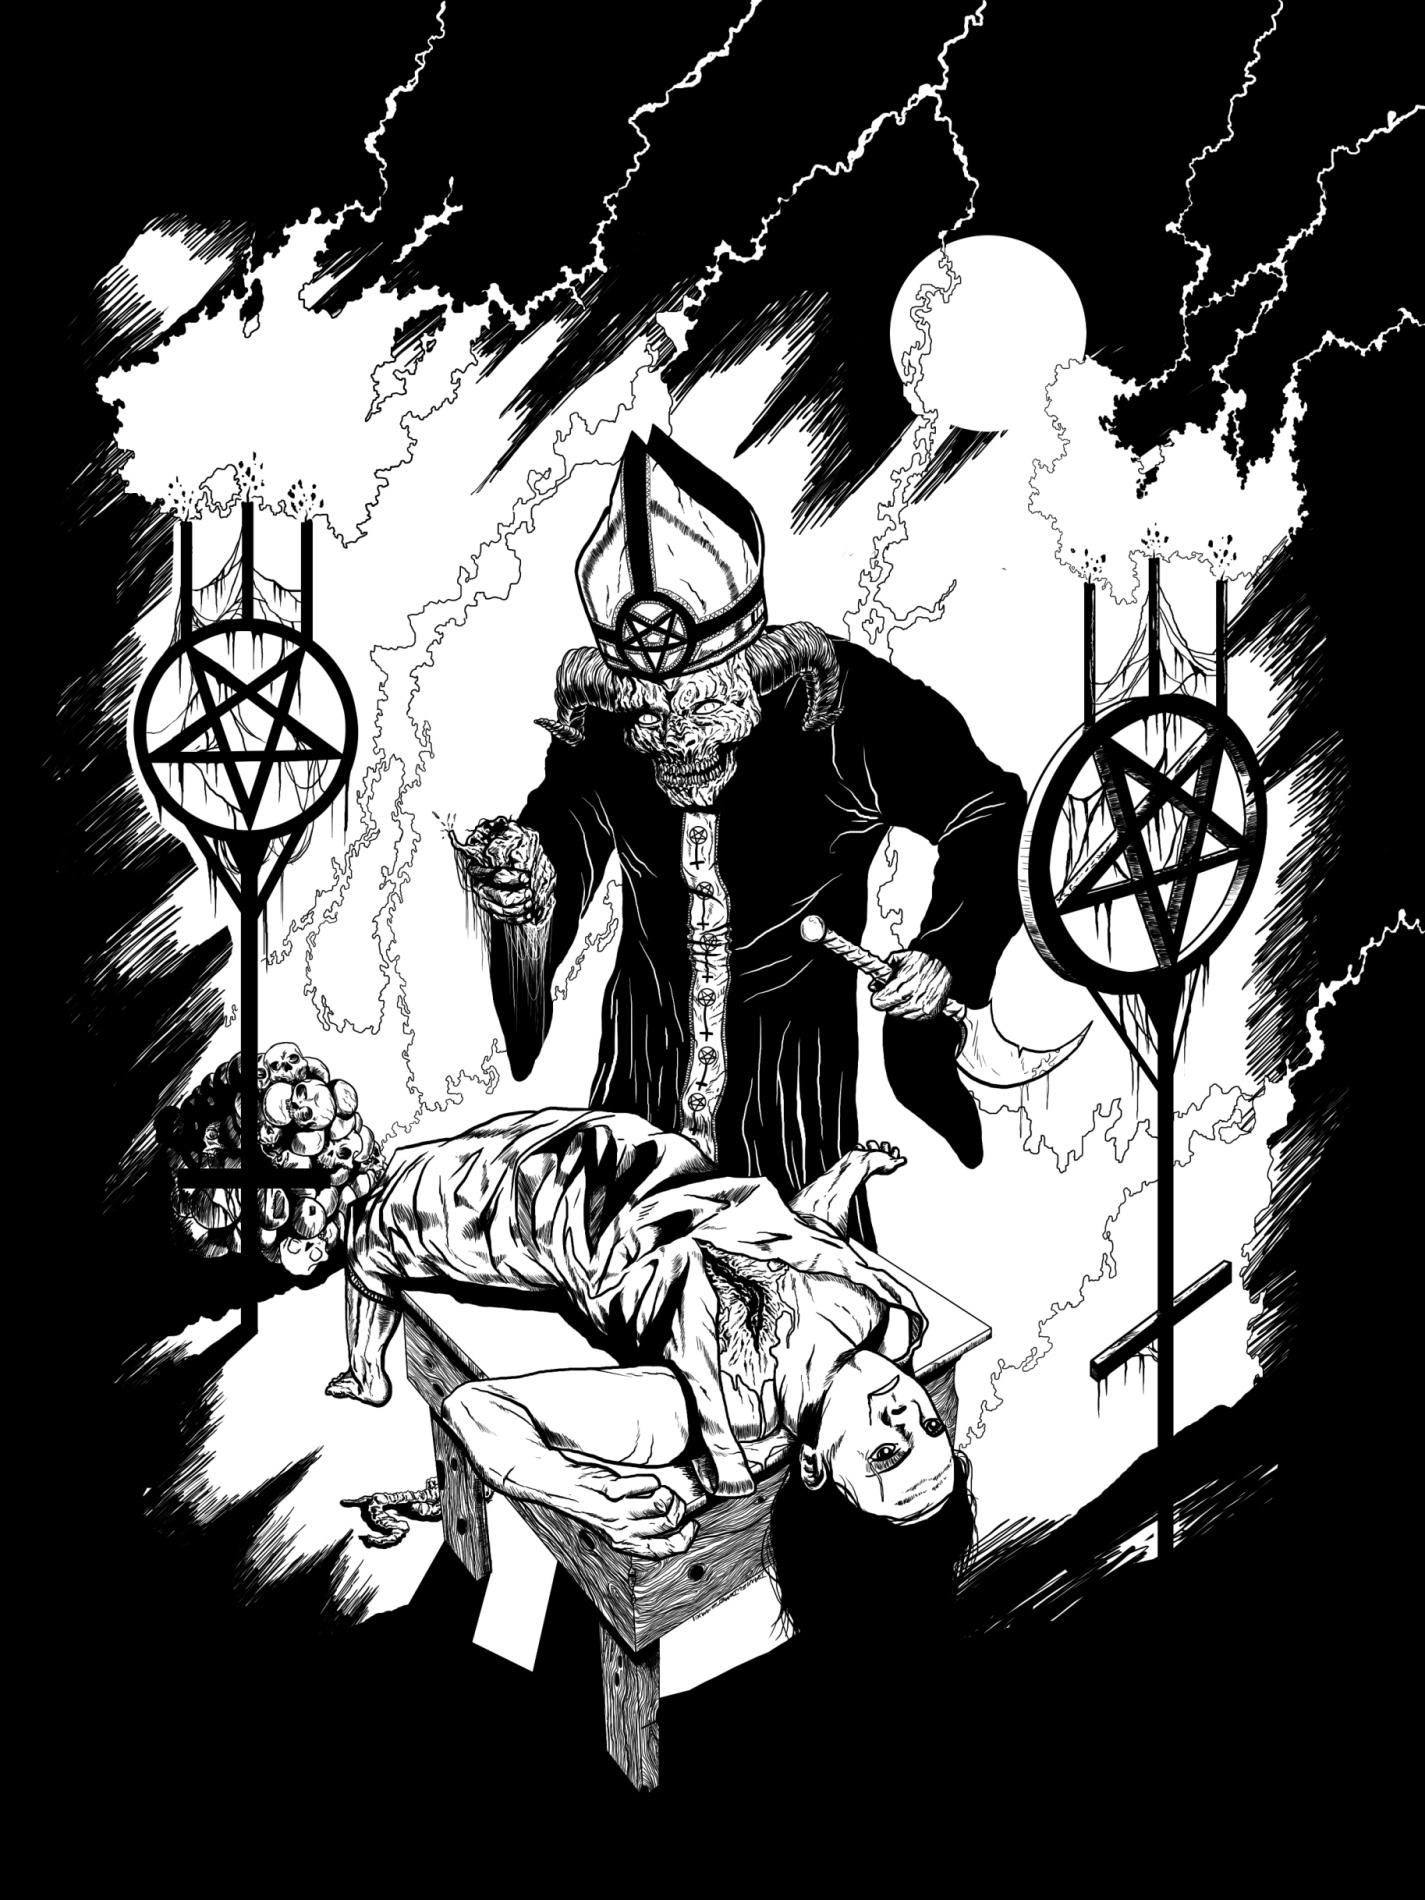 Upon the Altar of Sacrifice